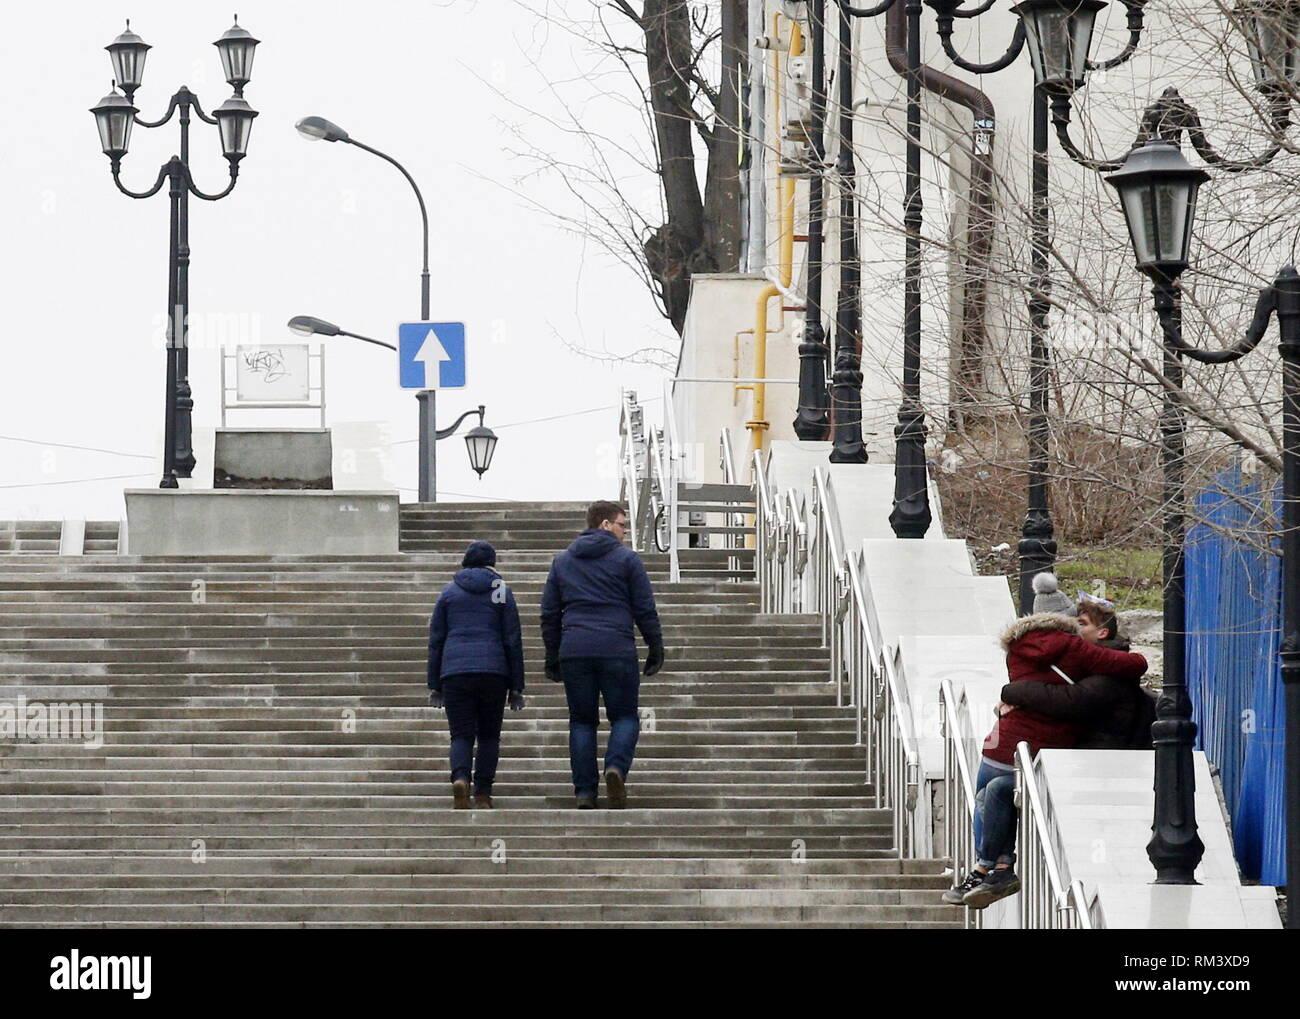 ROSTOV-ON-DON, RUSSIA - FEBRUARY 10, 2019: Couples seen in a street. Valery Matytsin/TASS - Stock Image